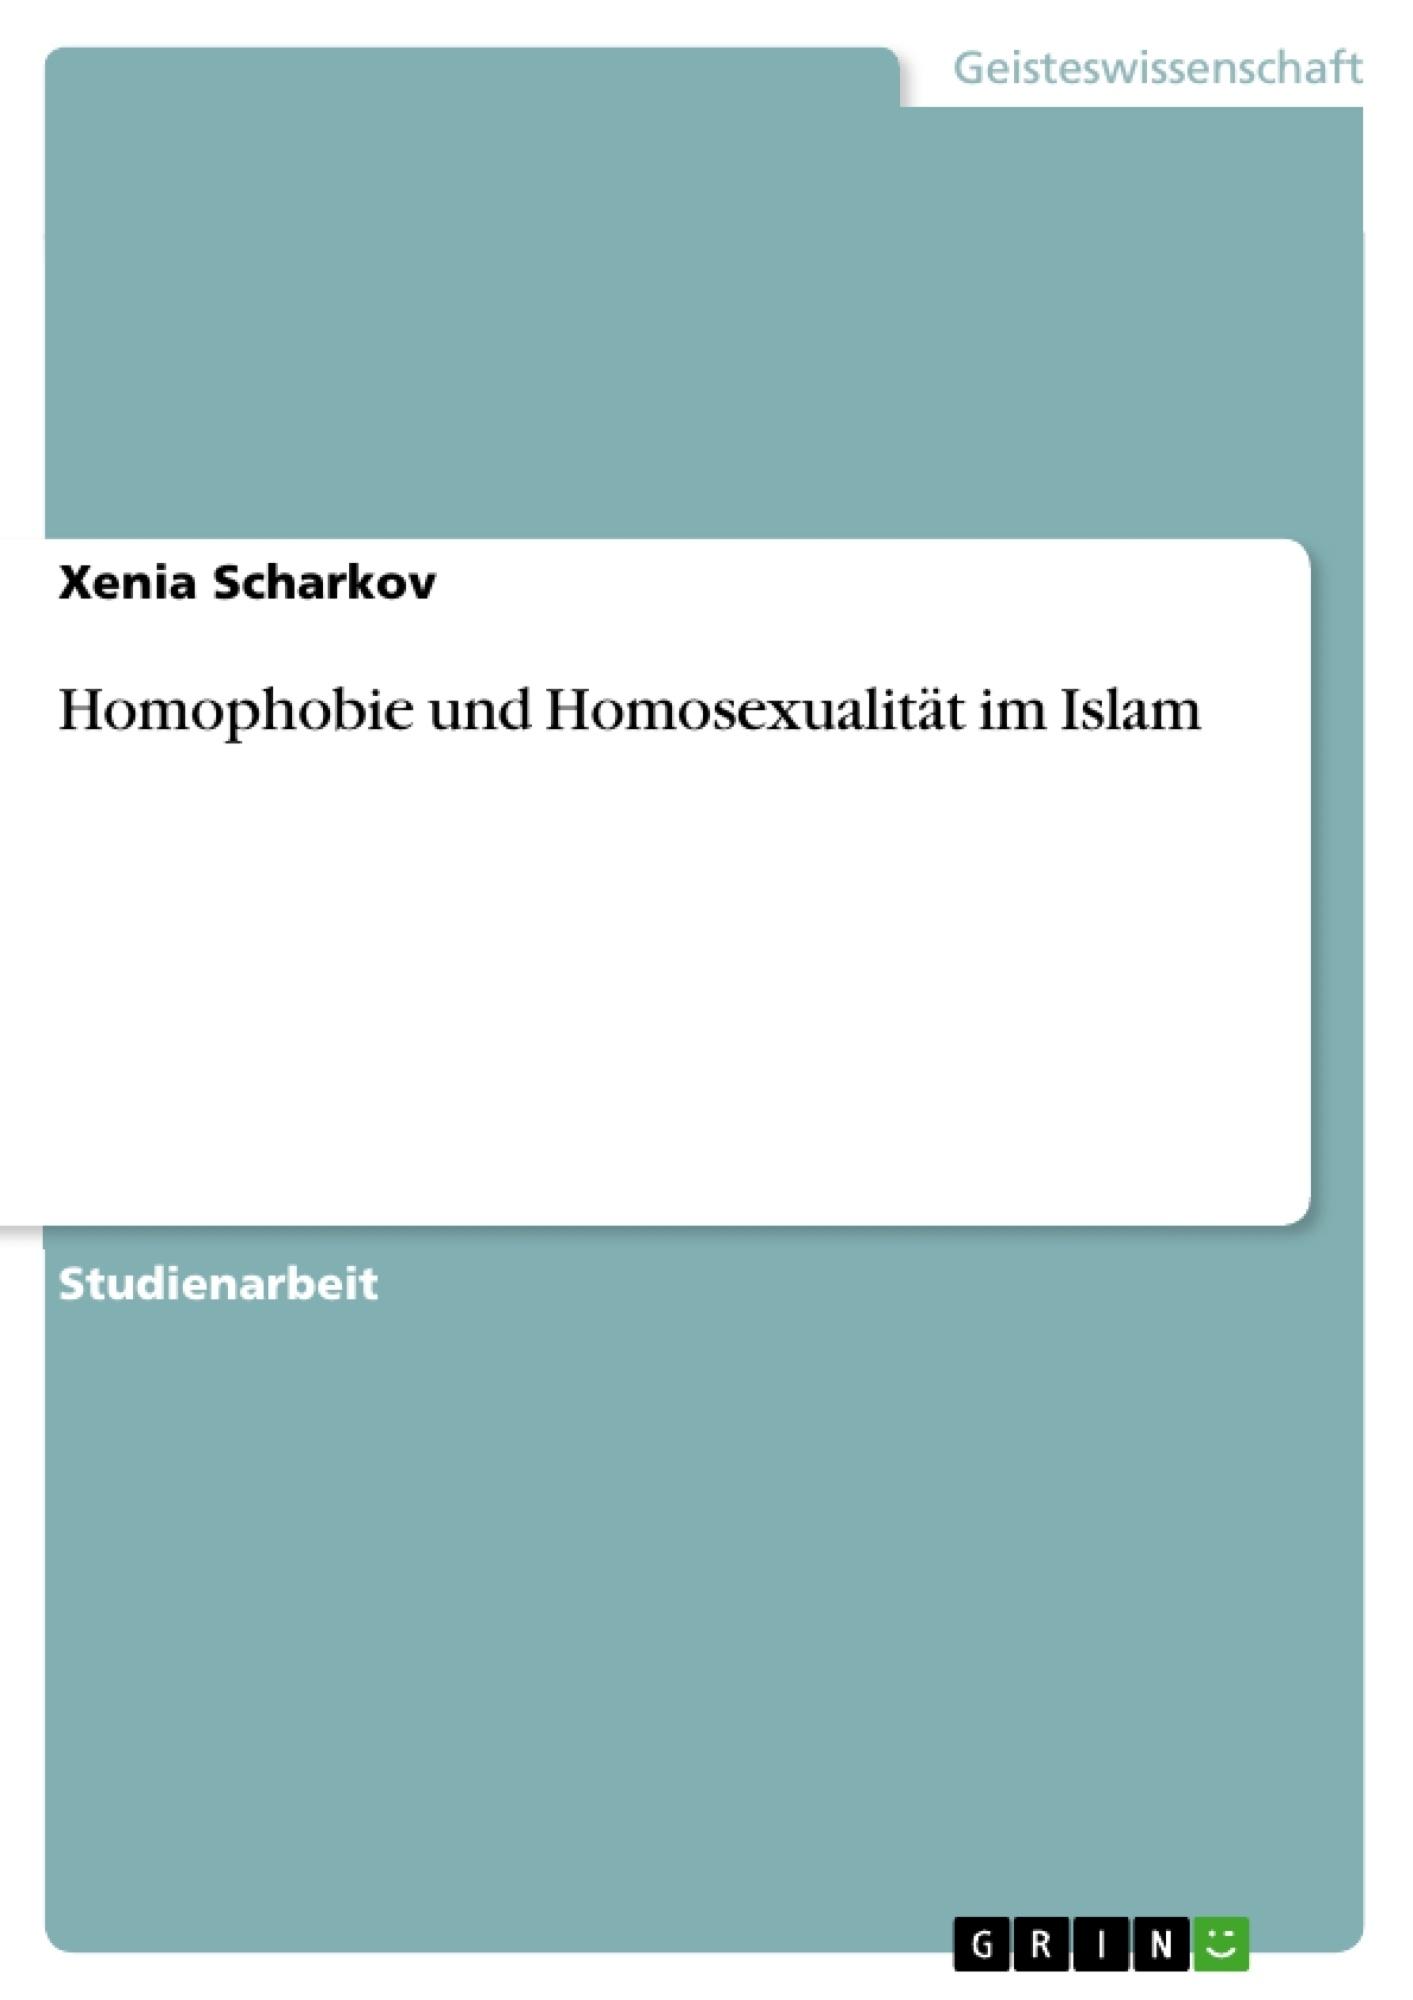 Titel: Homophobie und Homosexualität im Islam